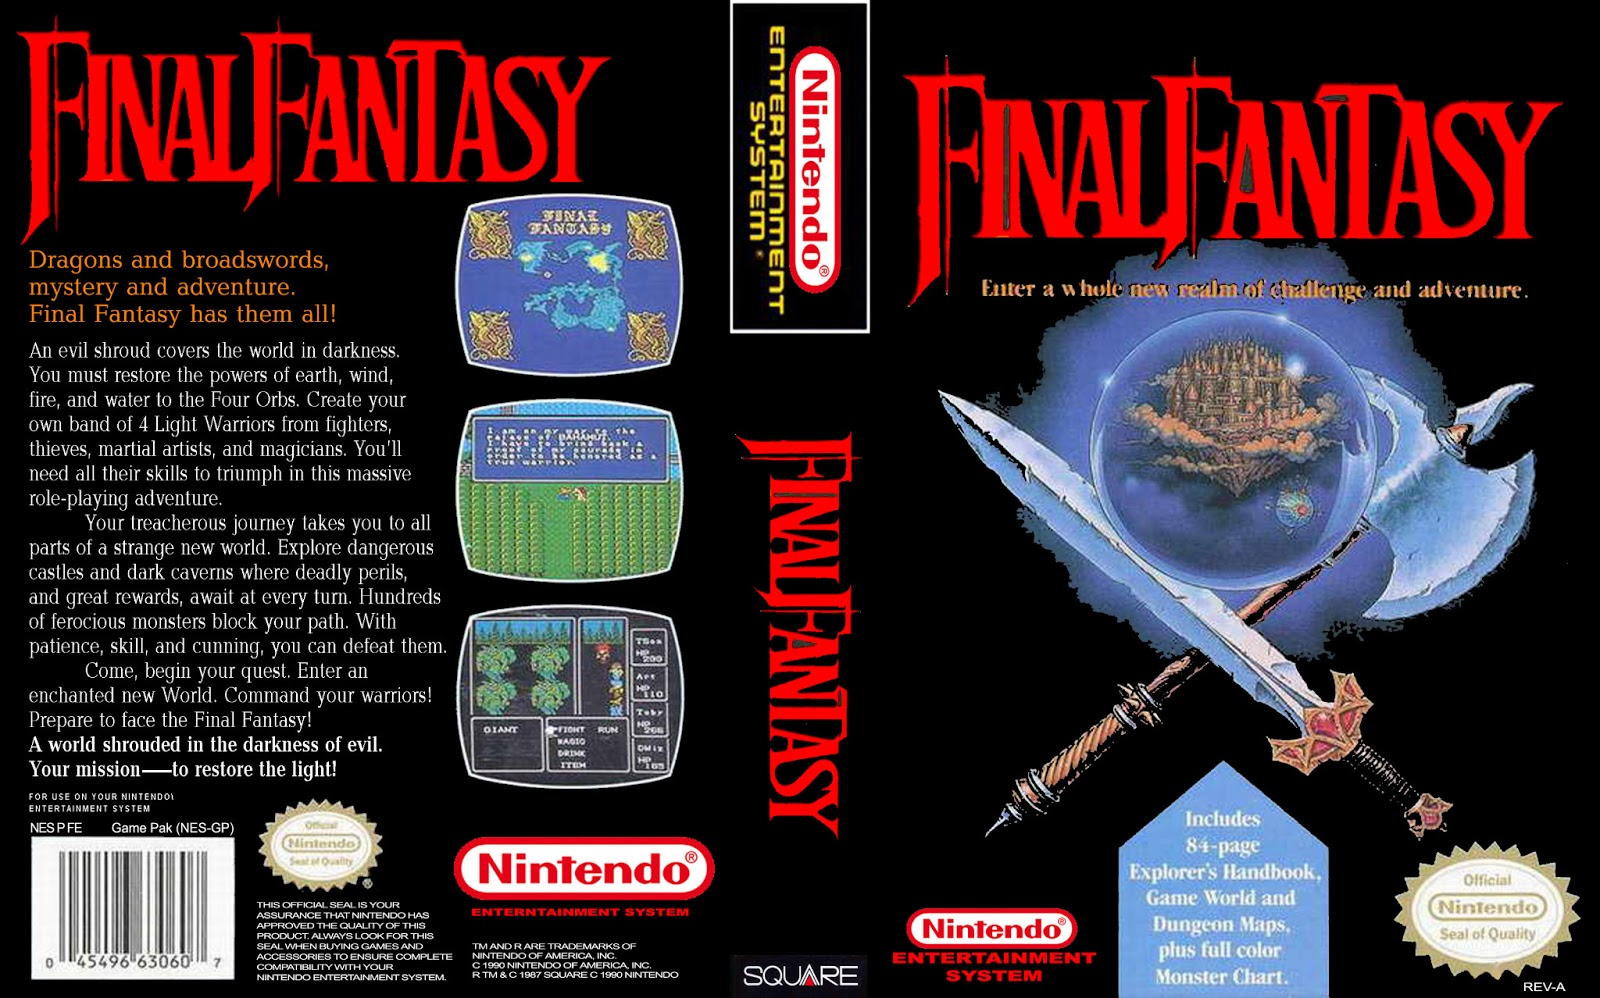 Final Fantasy 3 Snes Box Art